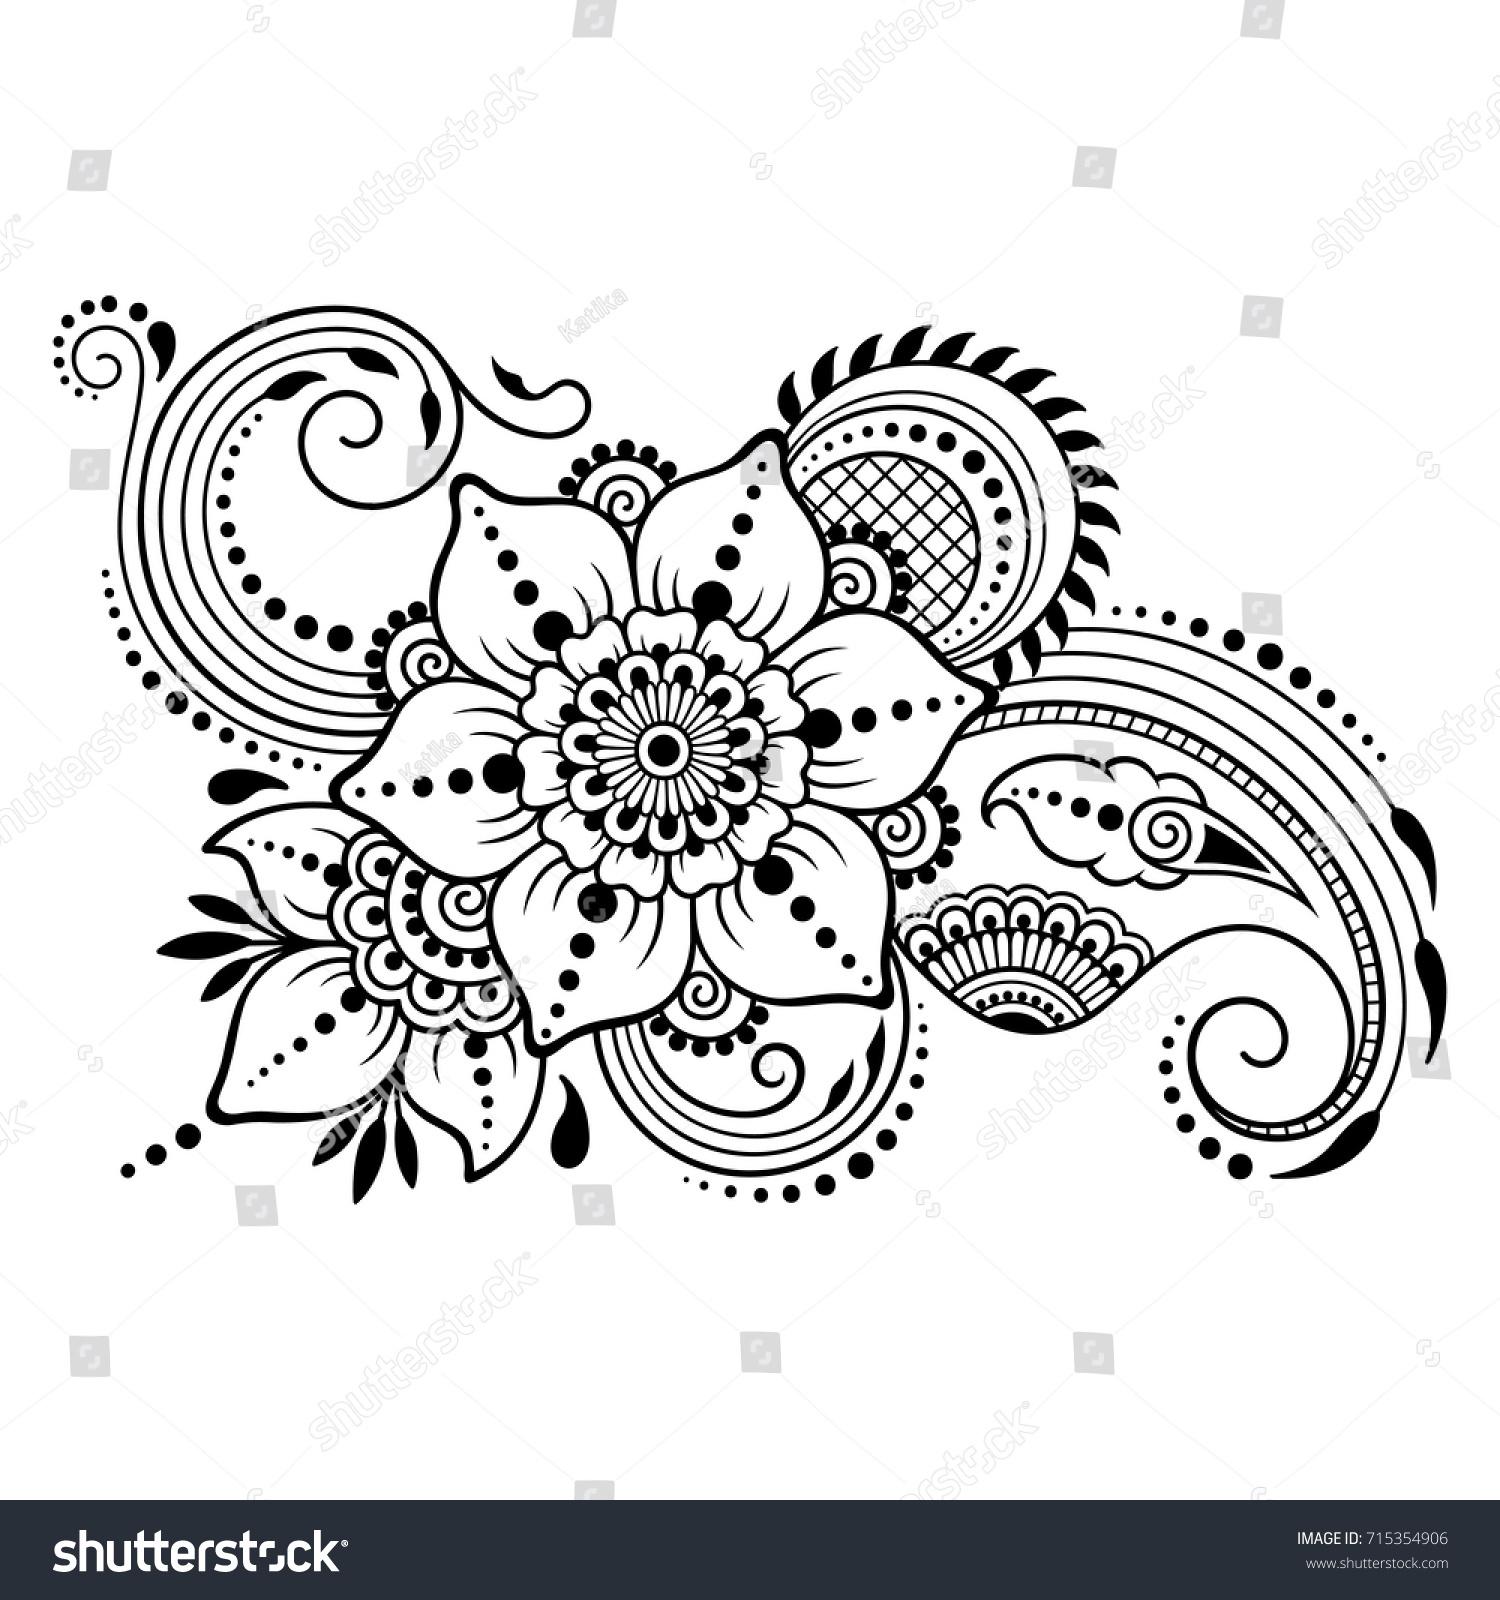 Henna Design Outline: Henna Tattoo Flower Template Mehndi Style Stock Vector